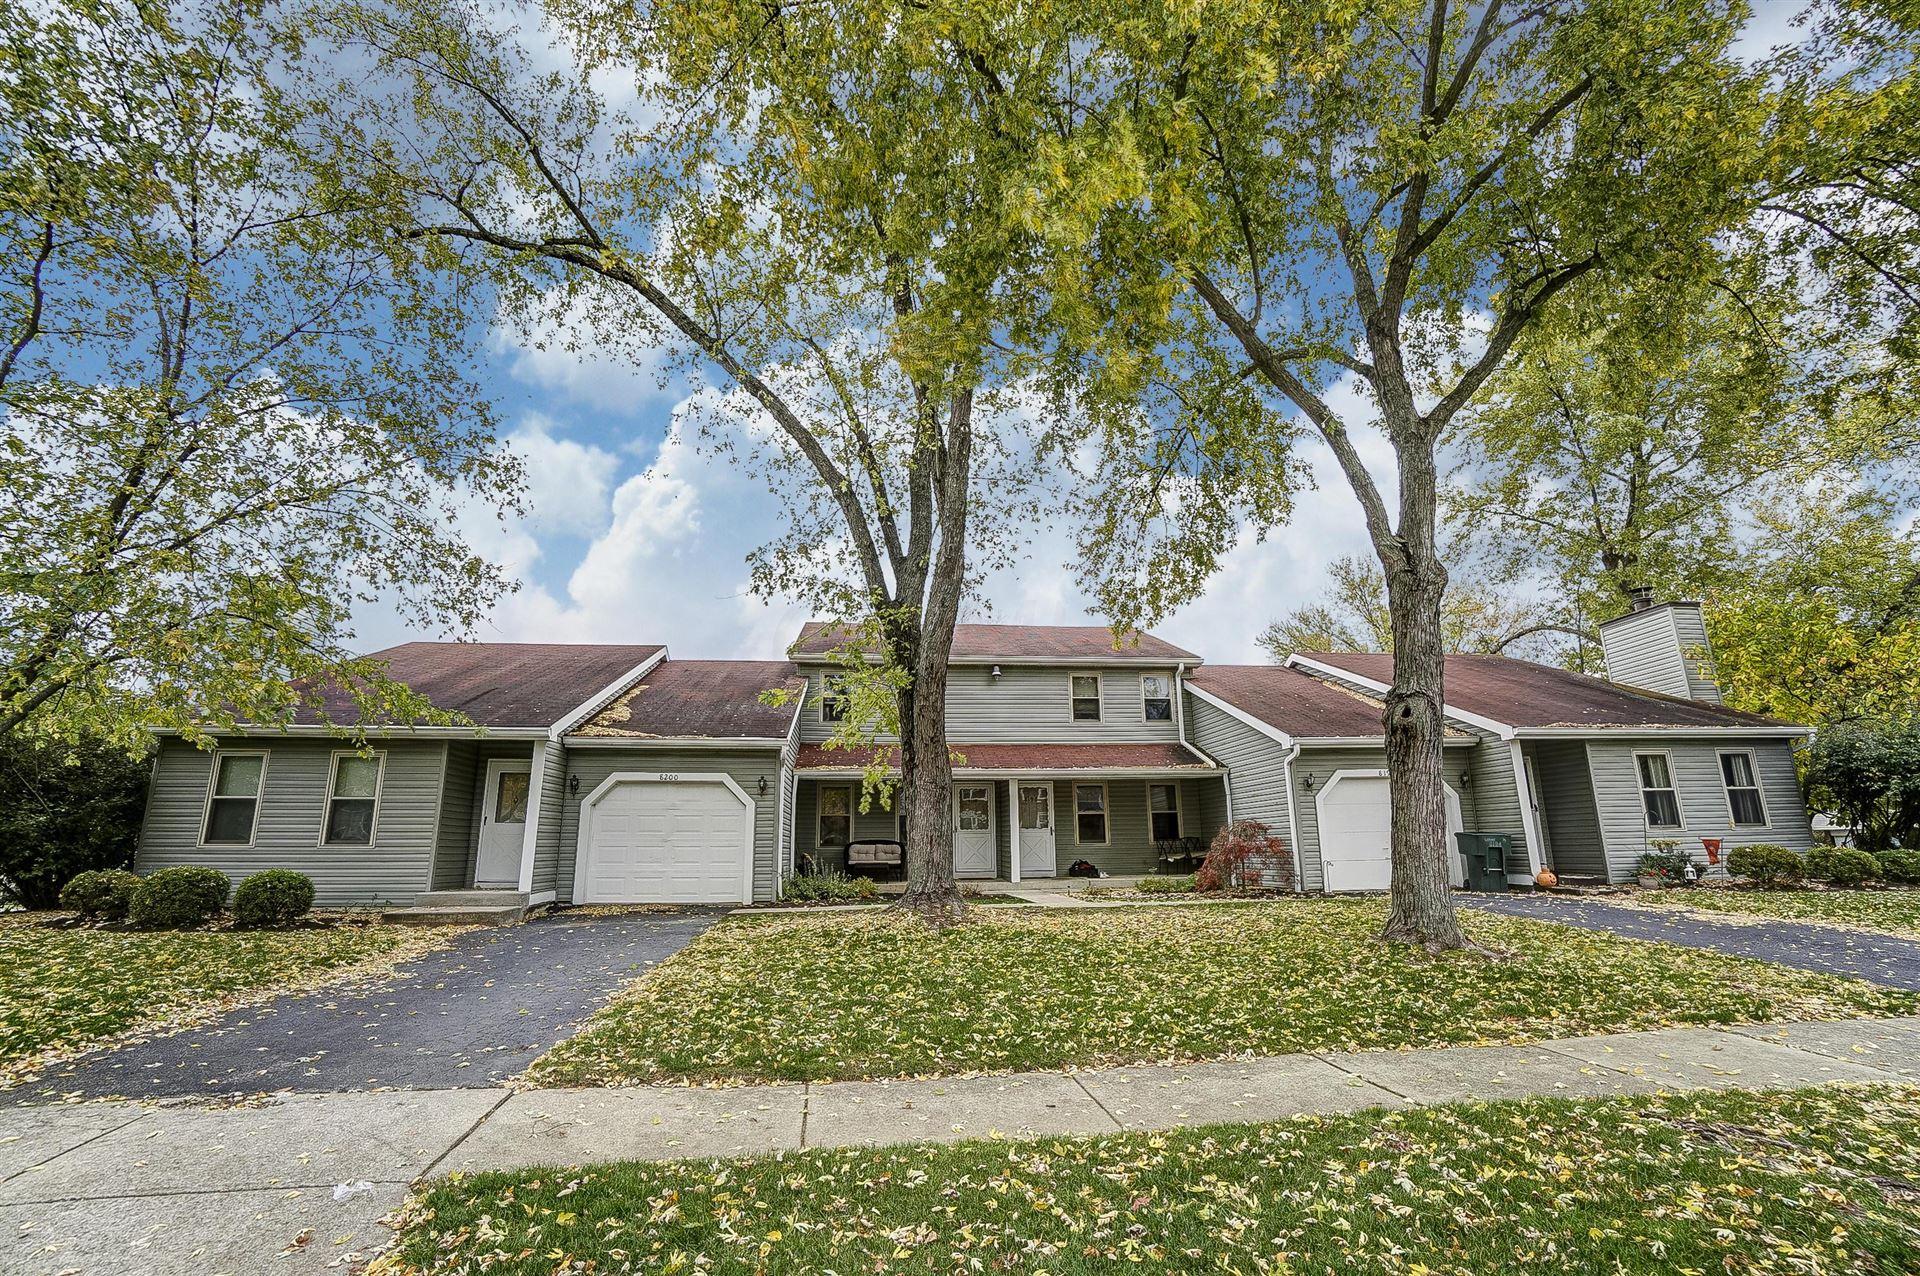 Photo of 8198 Laramie Place #10, Powell, OH 43065 (MLS # 220038452)